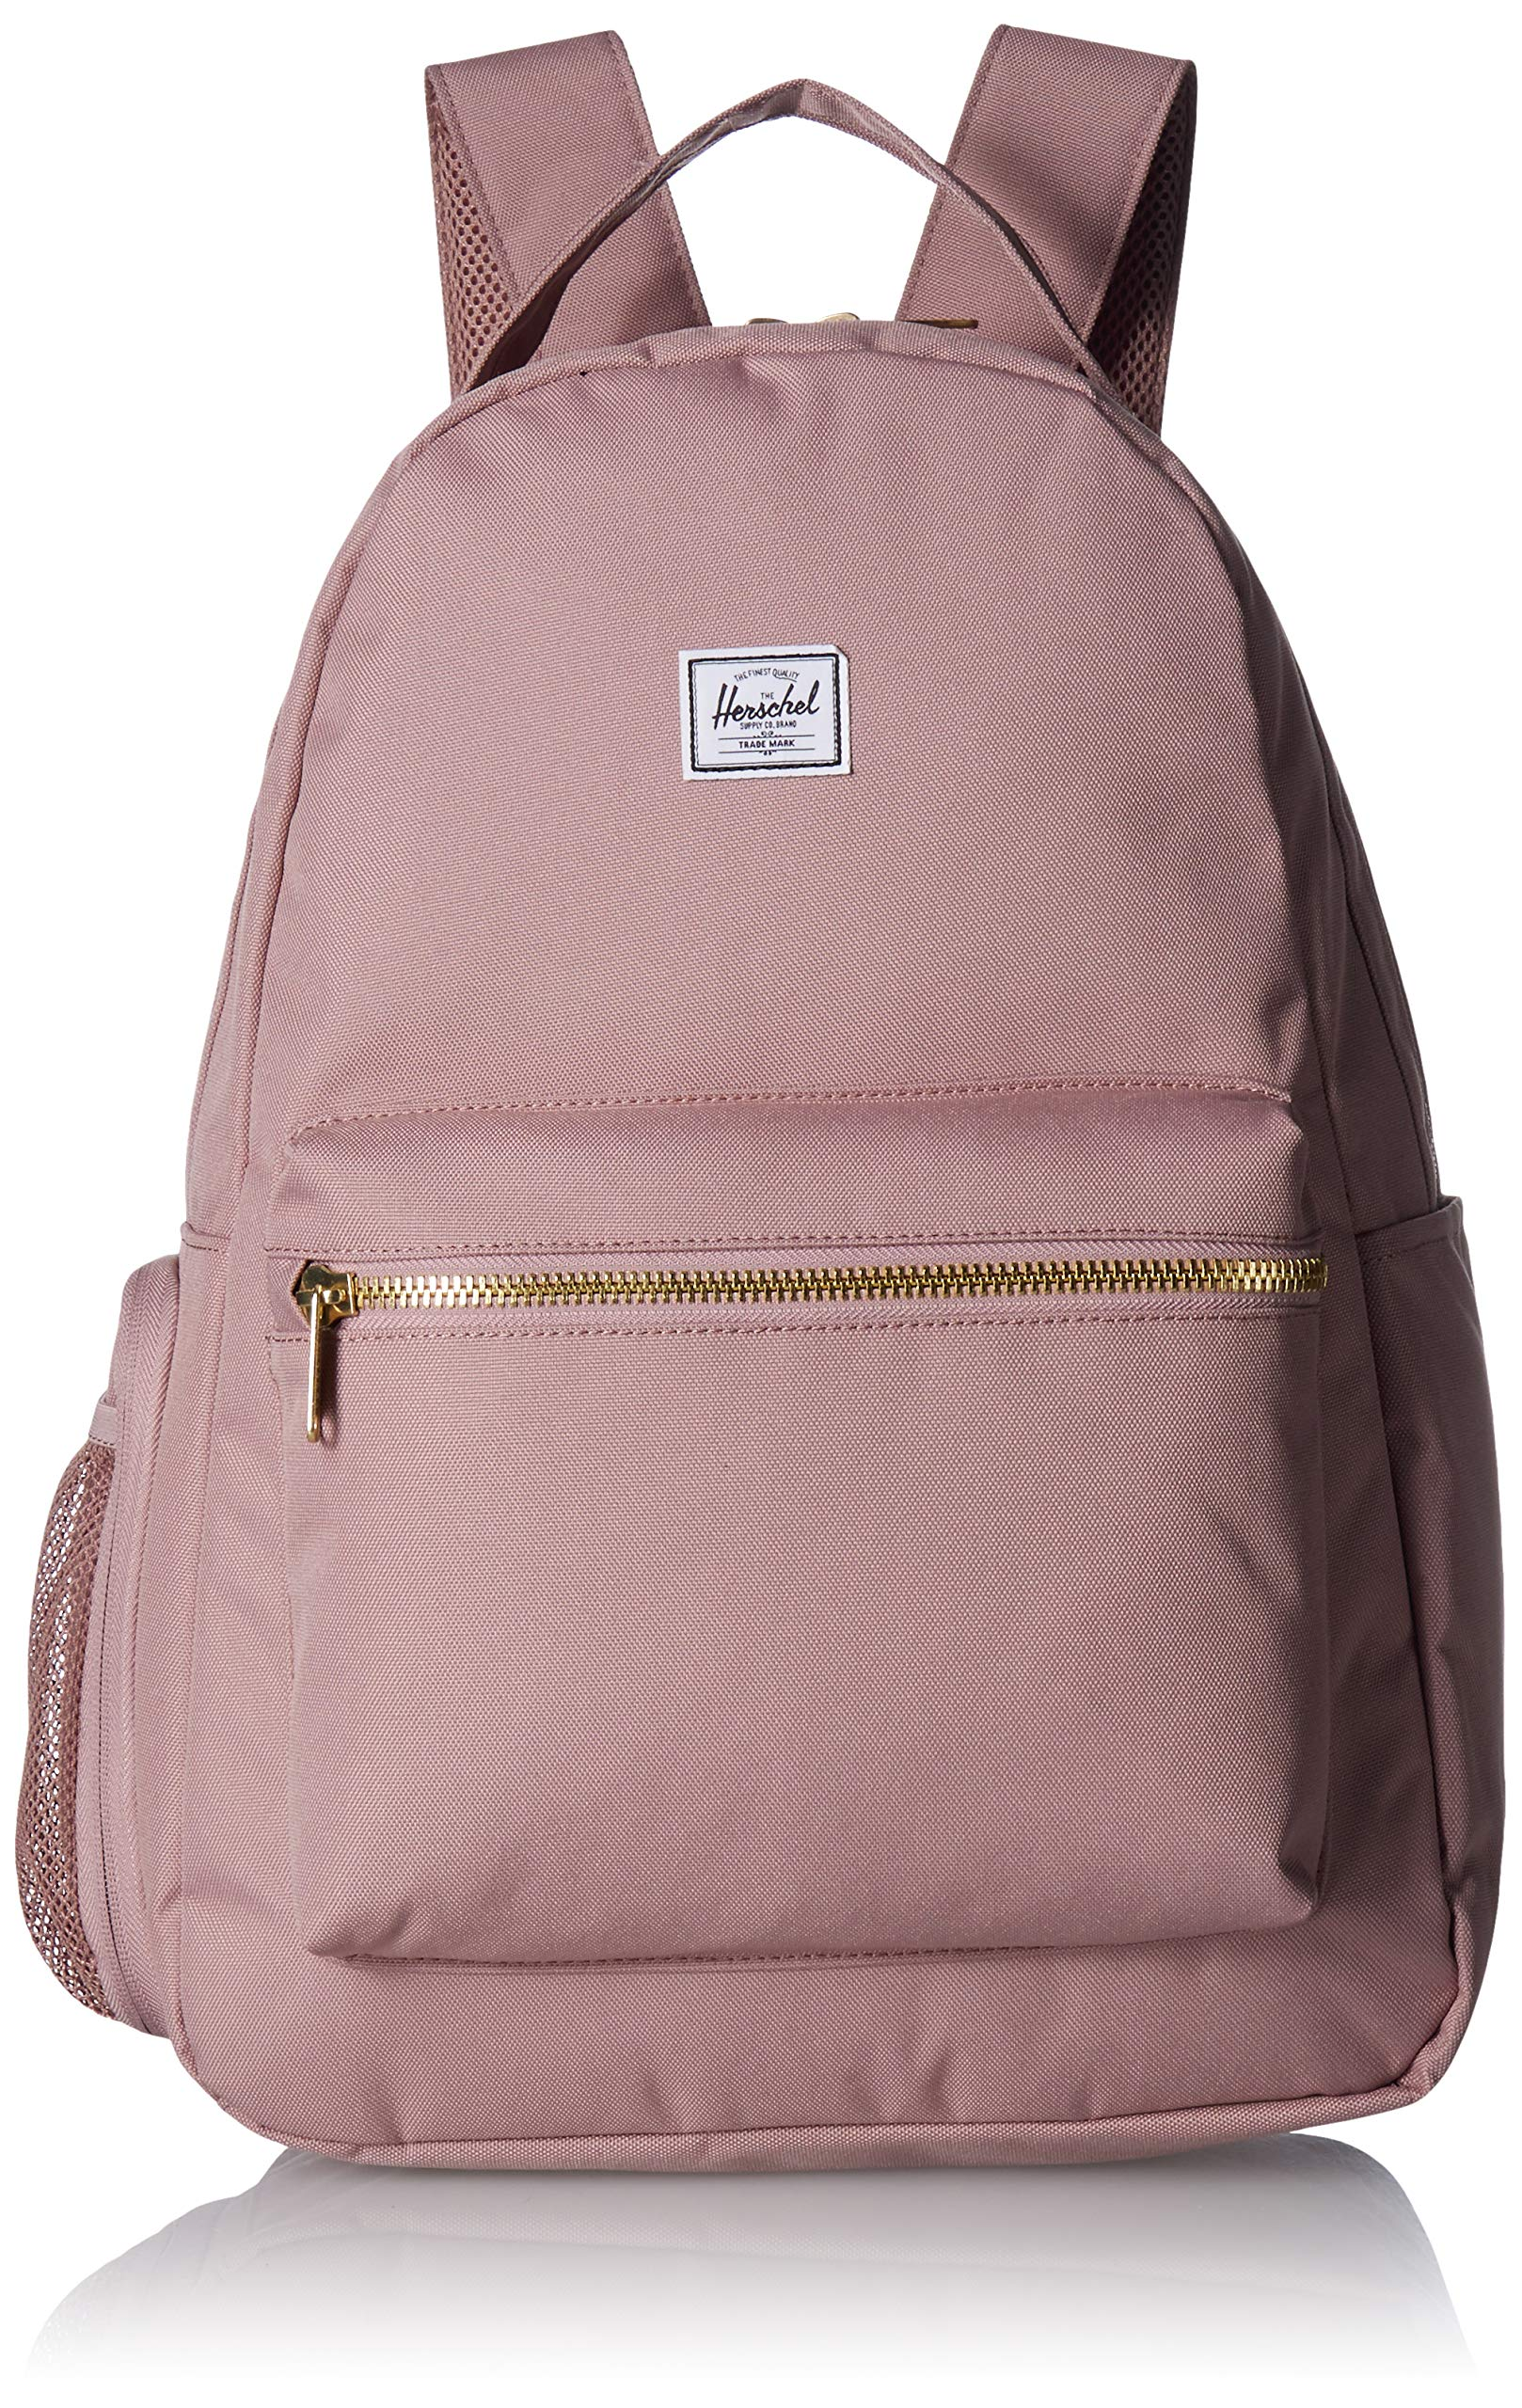 Herschel Baby Nova Sprout Backpack, Ash Rose, One